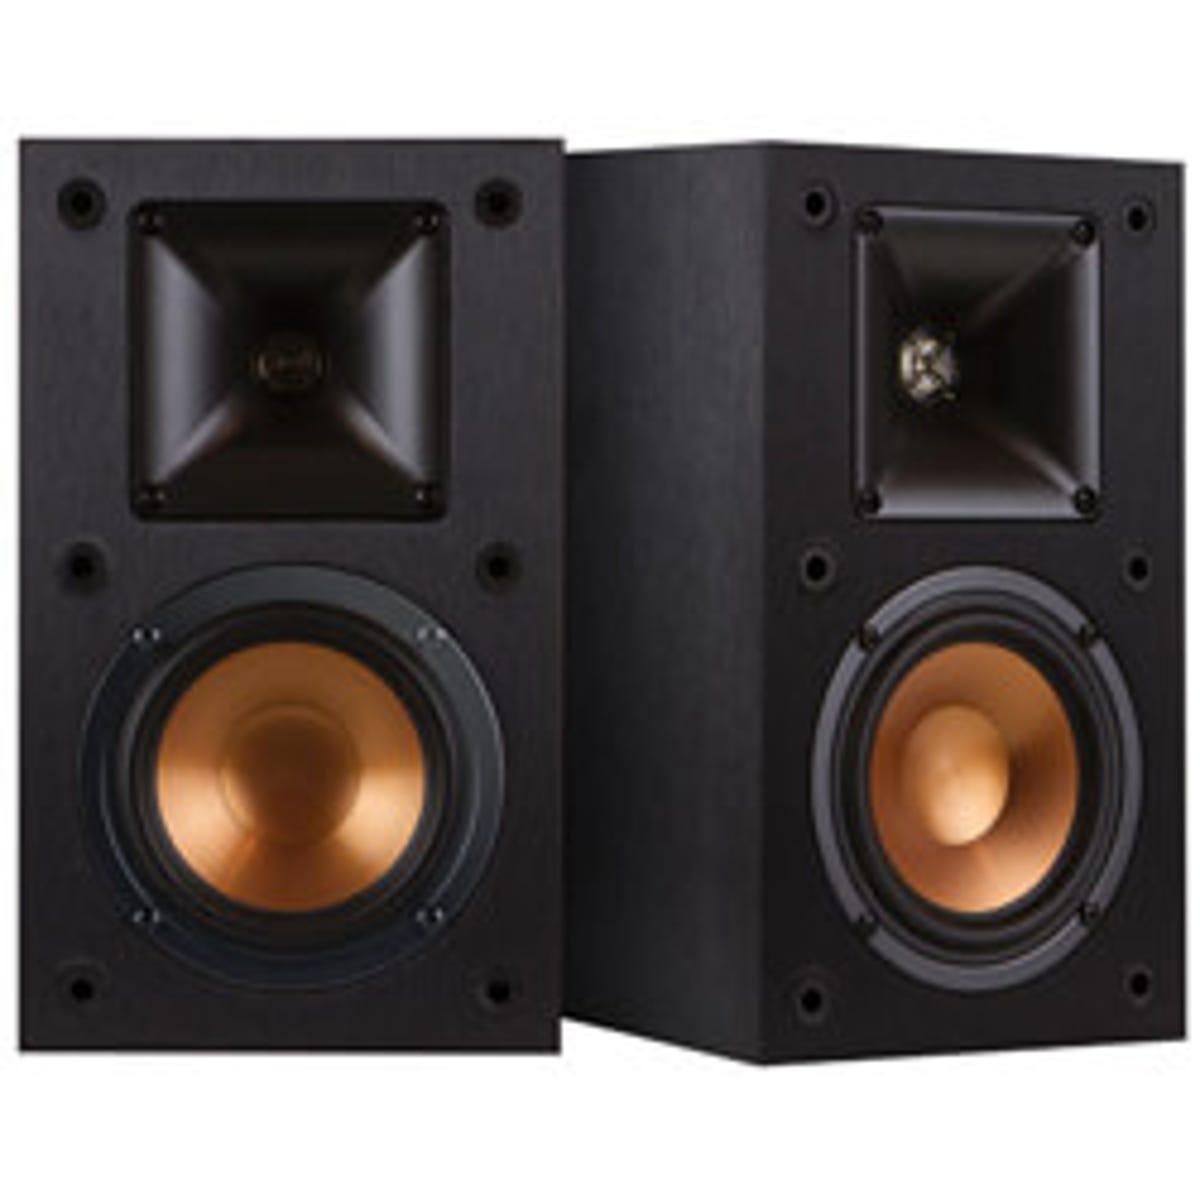 f313e1413c1 Home Audio & Speakers | Best Buy Canada